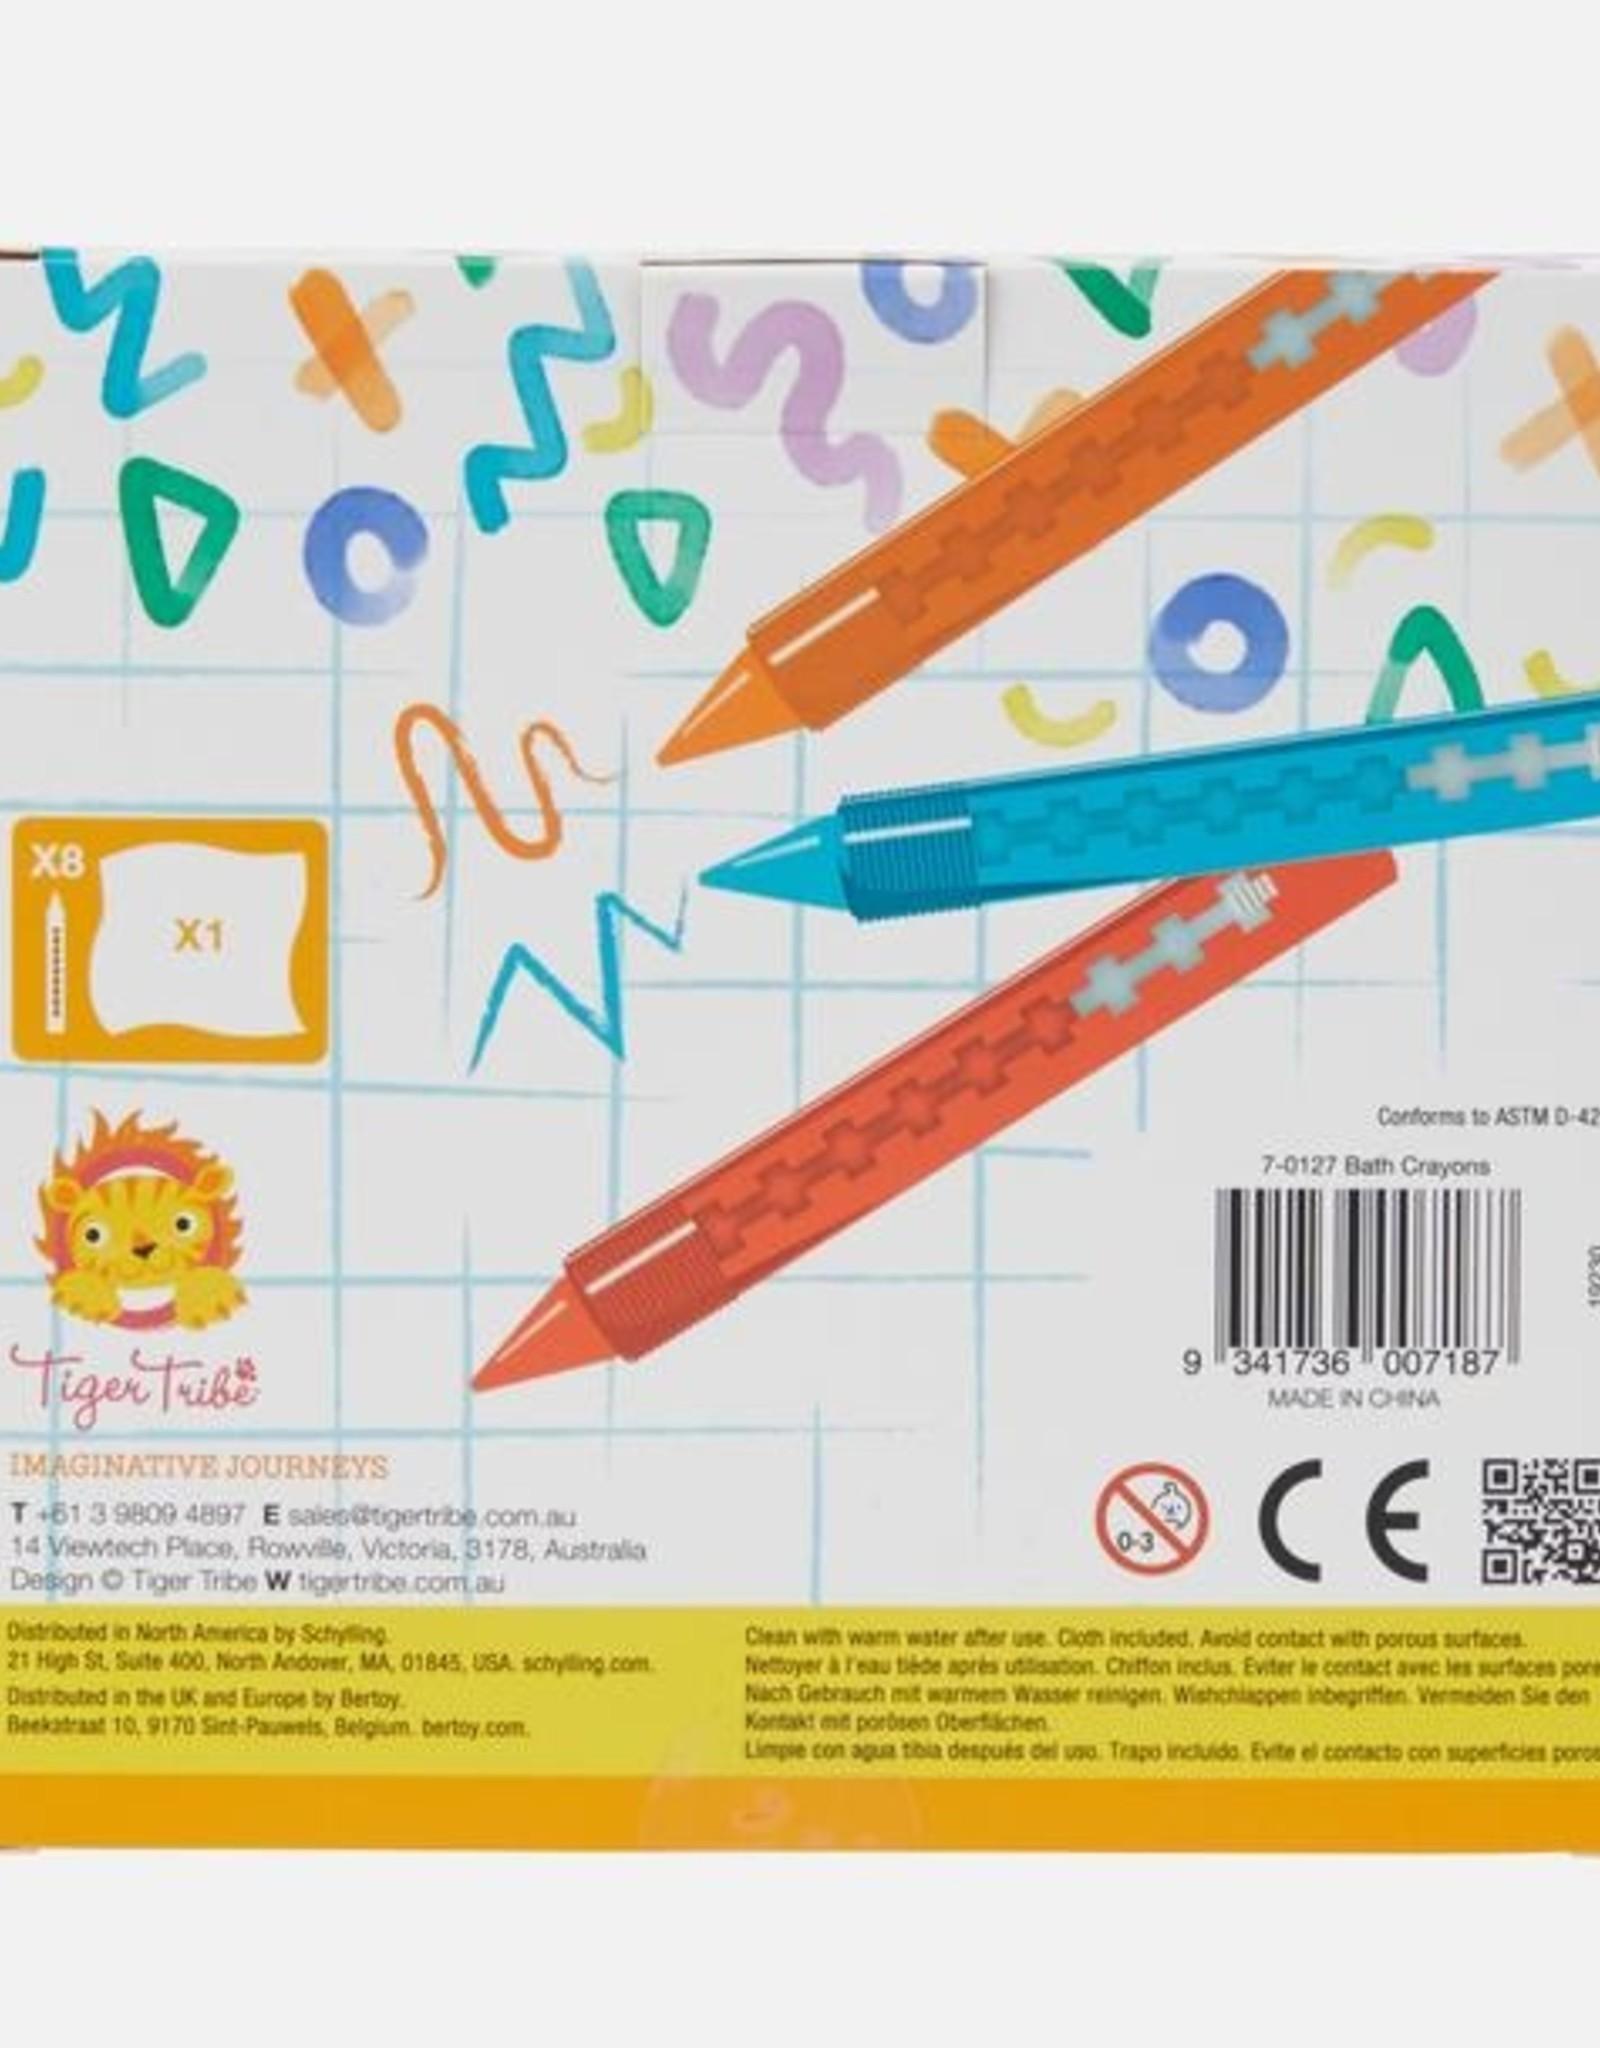 Tiger Tribe Tiger Tribe - Bath Crayons